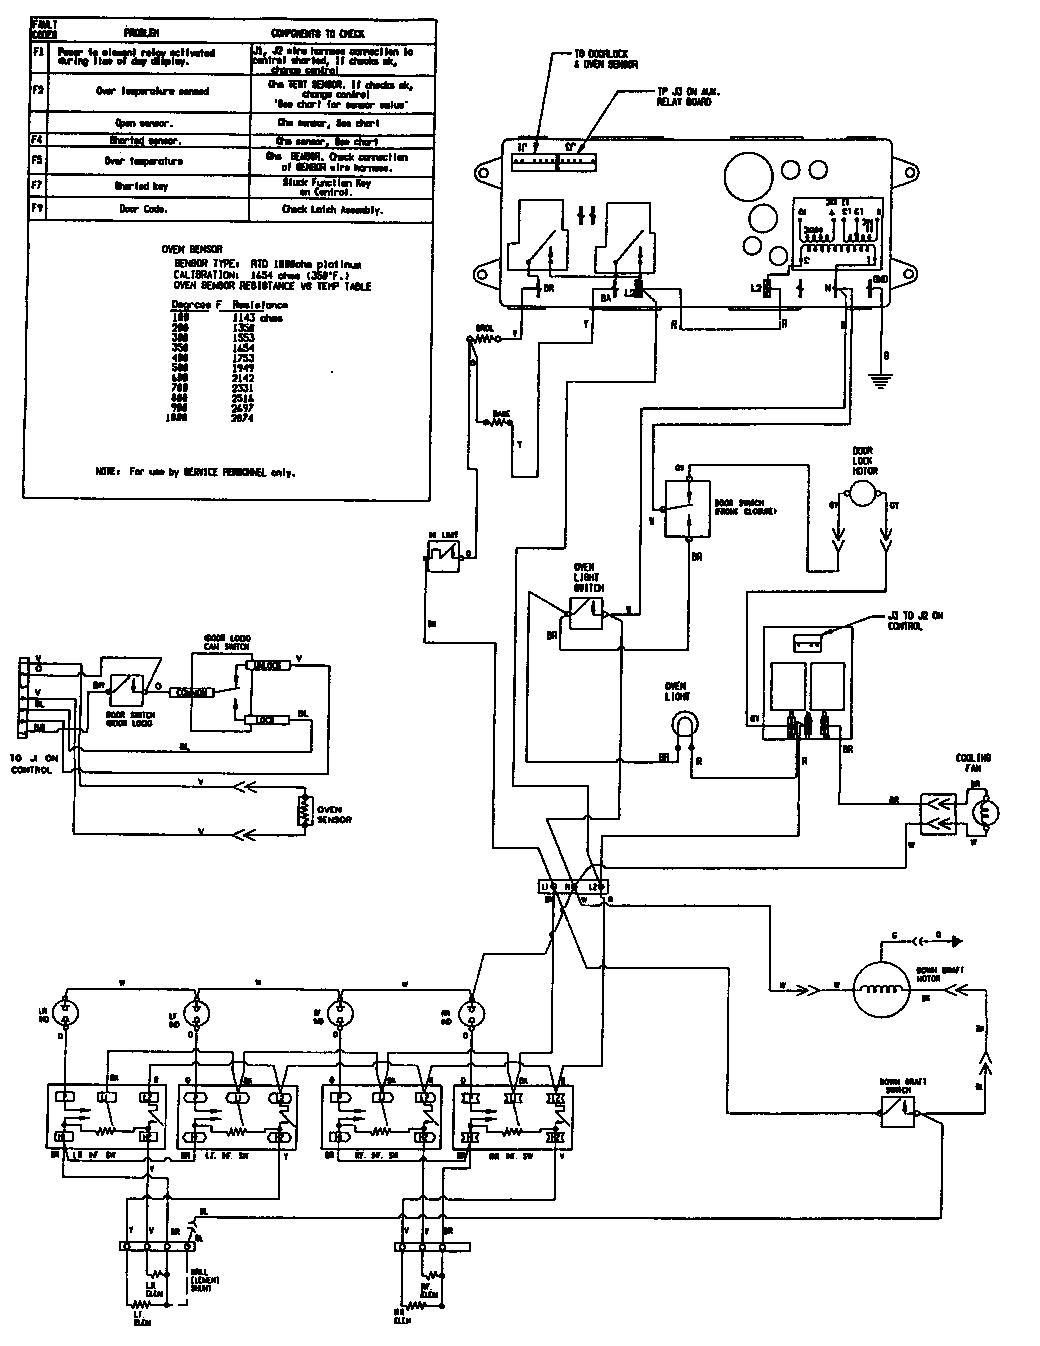 Ge Electric Range Wiring Diagram. Ge Gas Dryer Diagram, Ge ... on